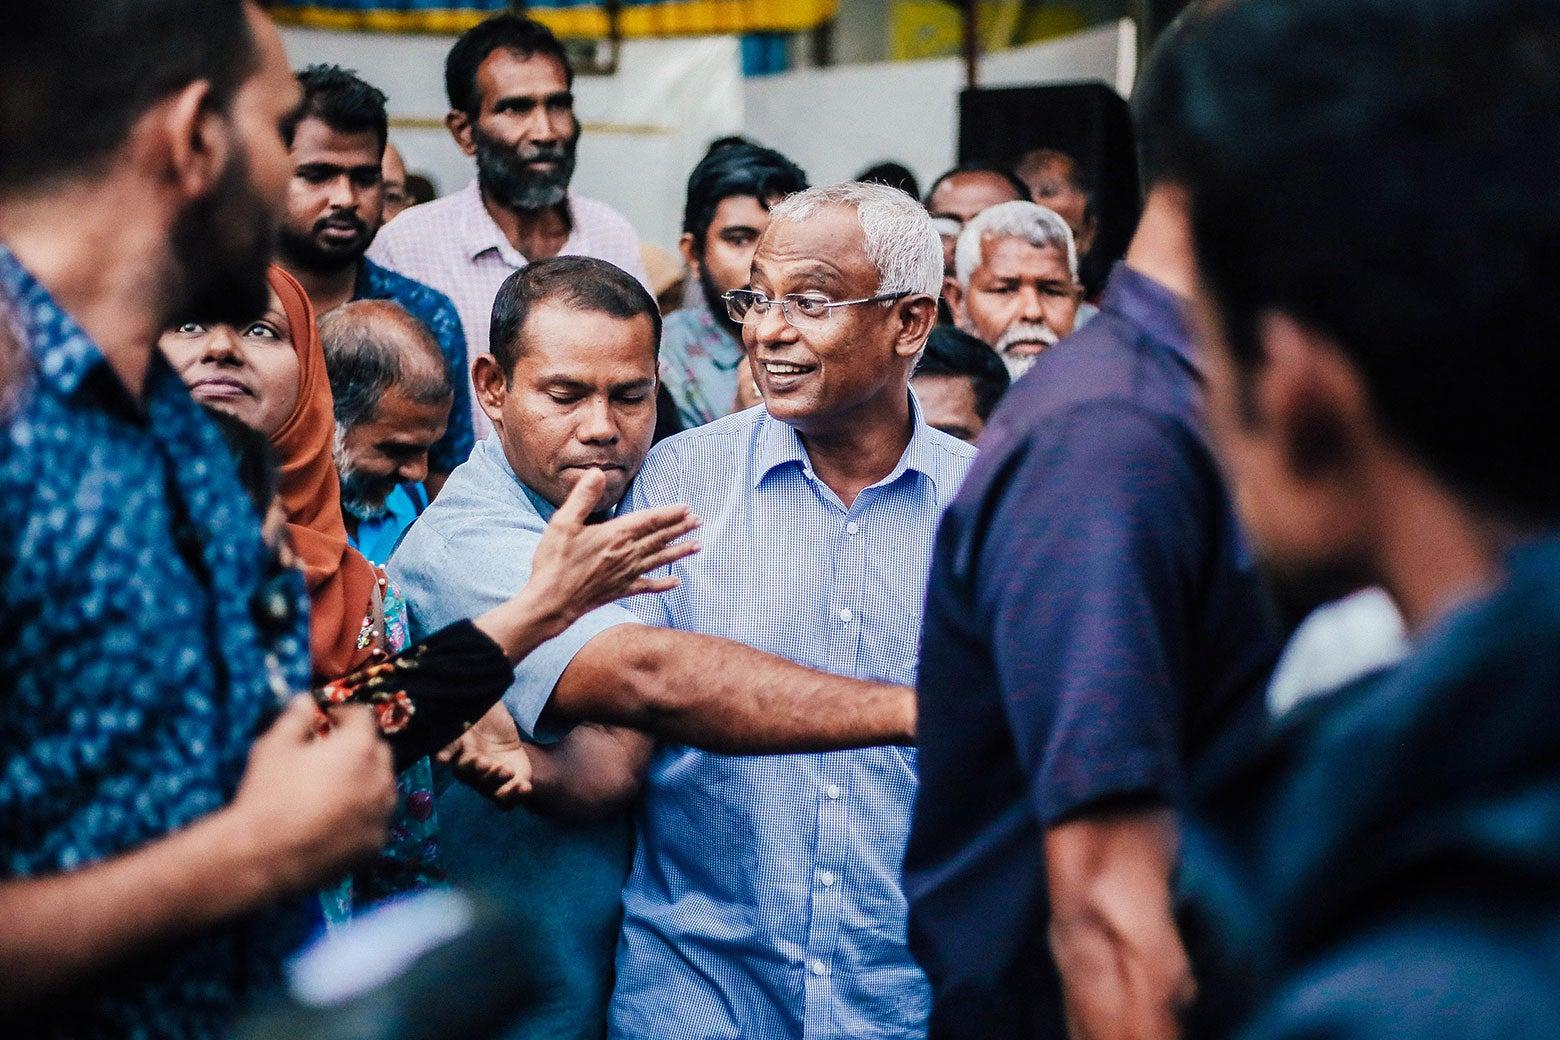 Maldives President-elect Ibrahim Mohamed Solih participates in celebrations.